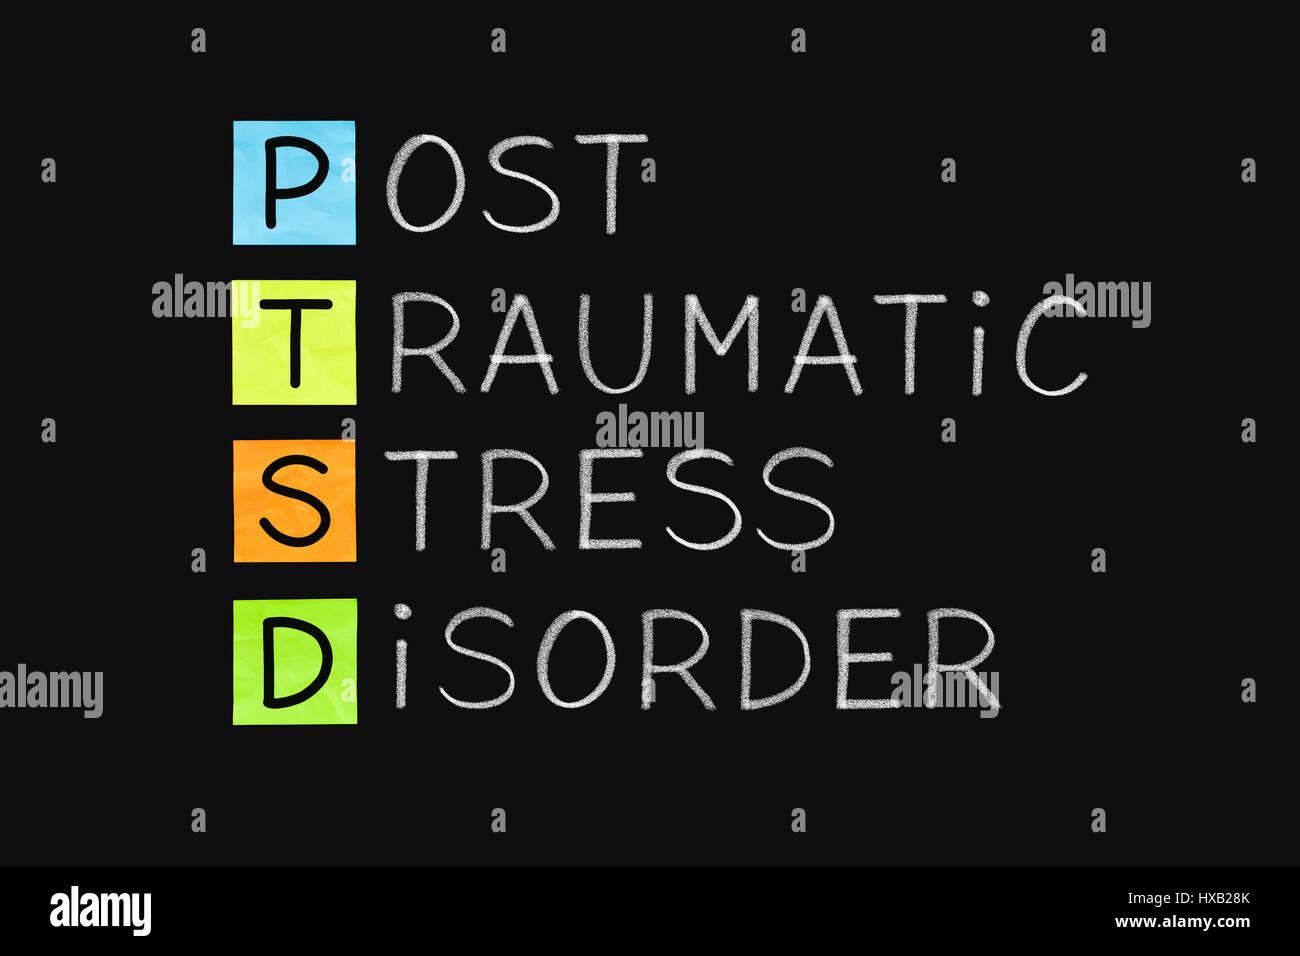 PTSD acronym Post Traumatic Stress Disorder handwritten with white chalk on blackboard. - Stock Image